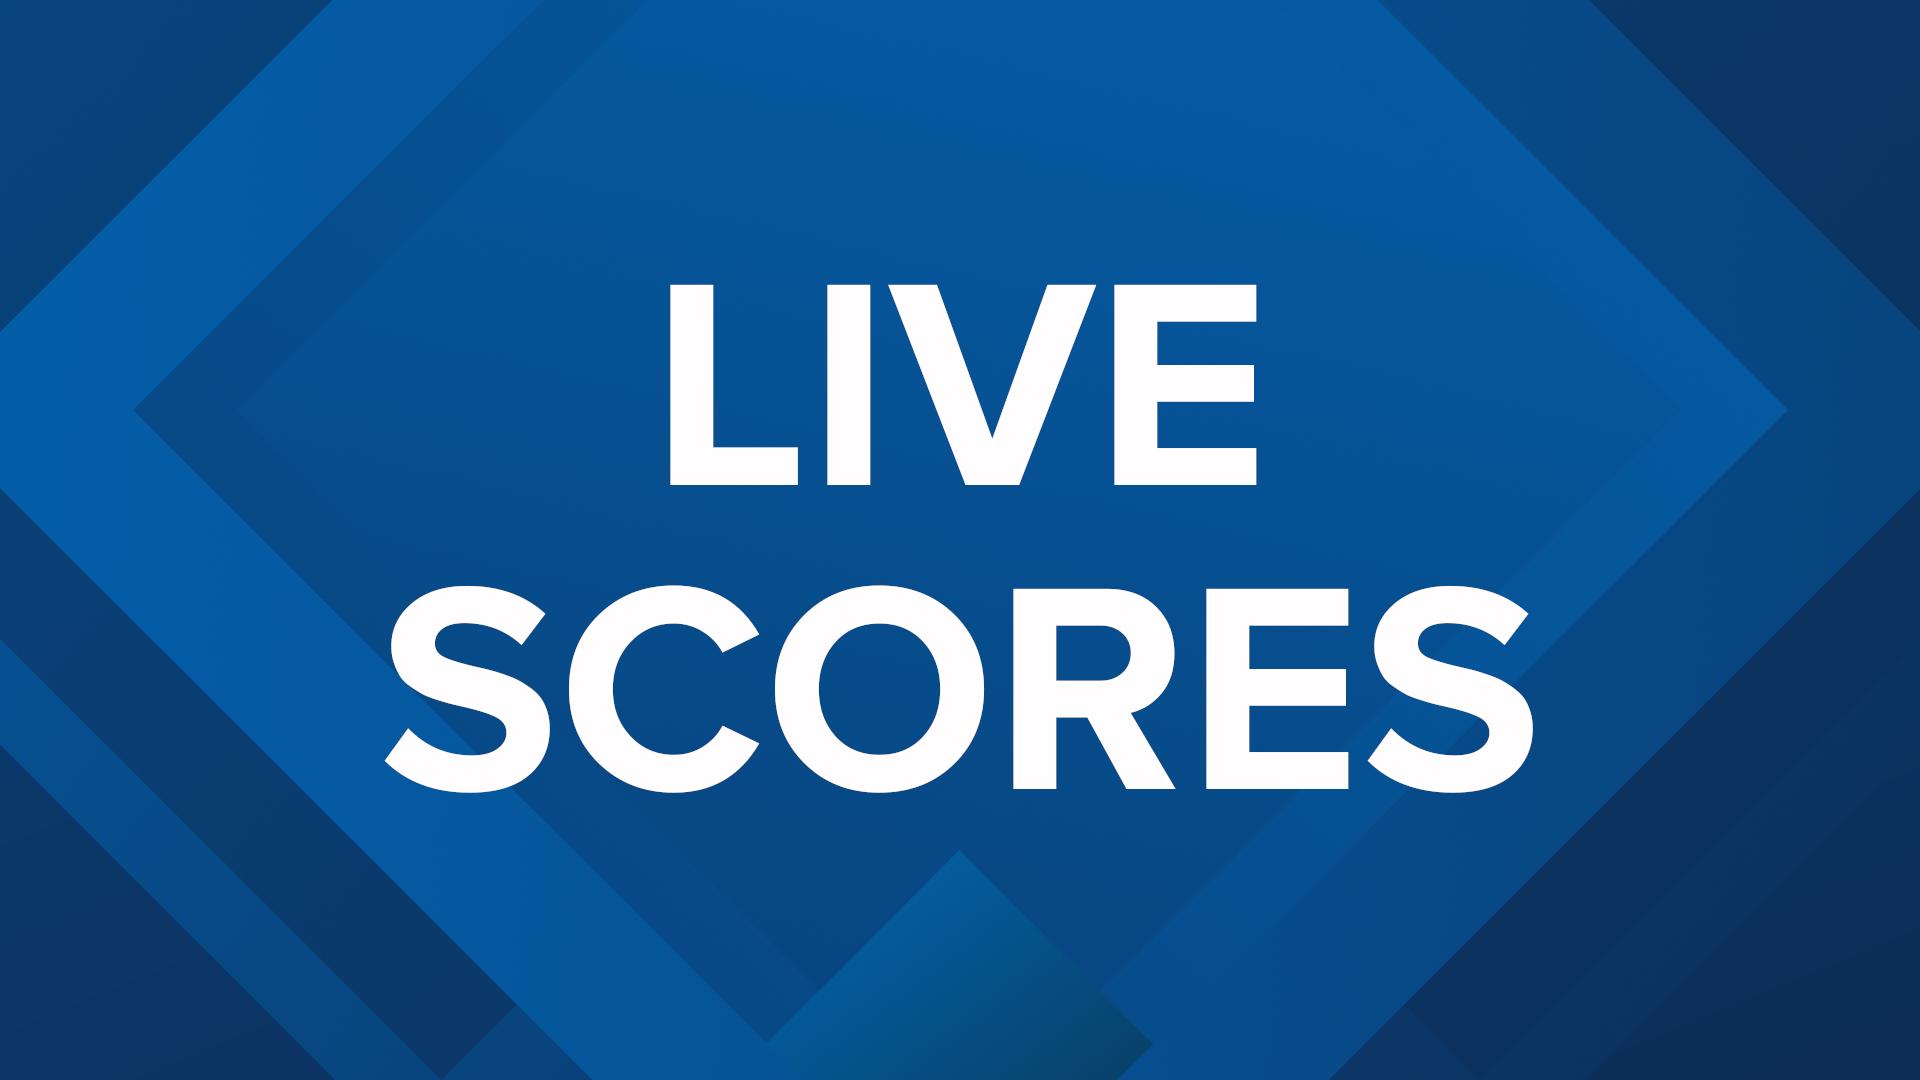 Live High School Scores